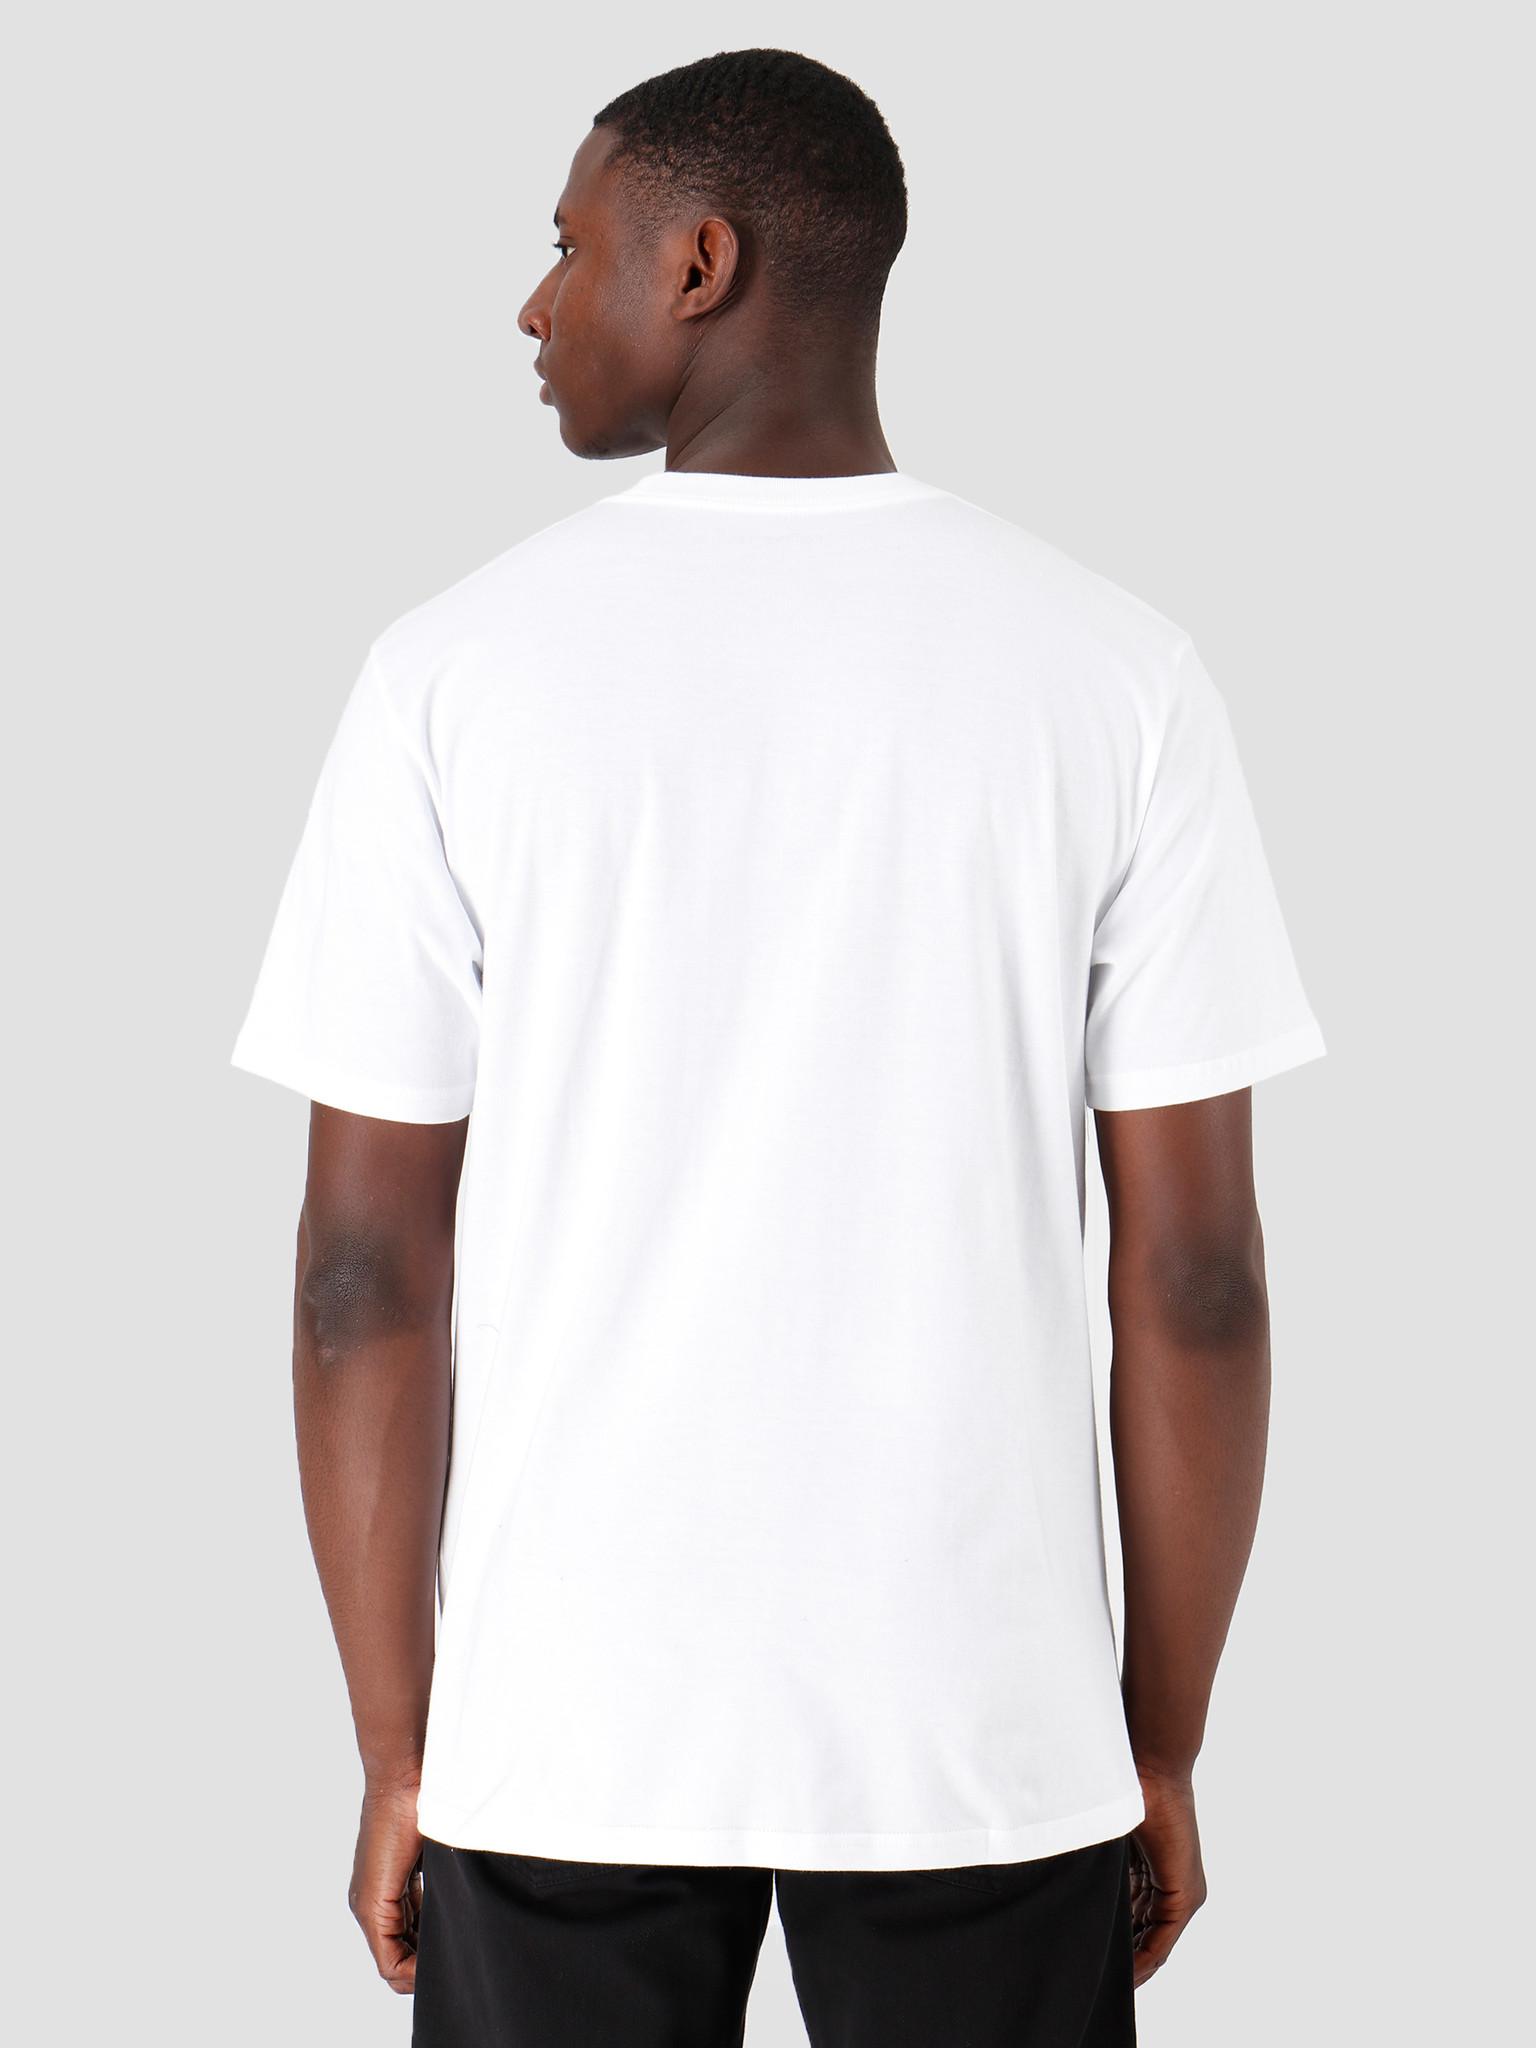 Carhartt WIP Carhartt WIP Match T Shirt White I027095